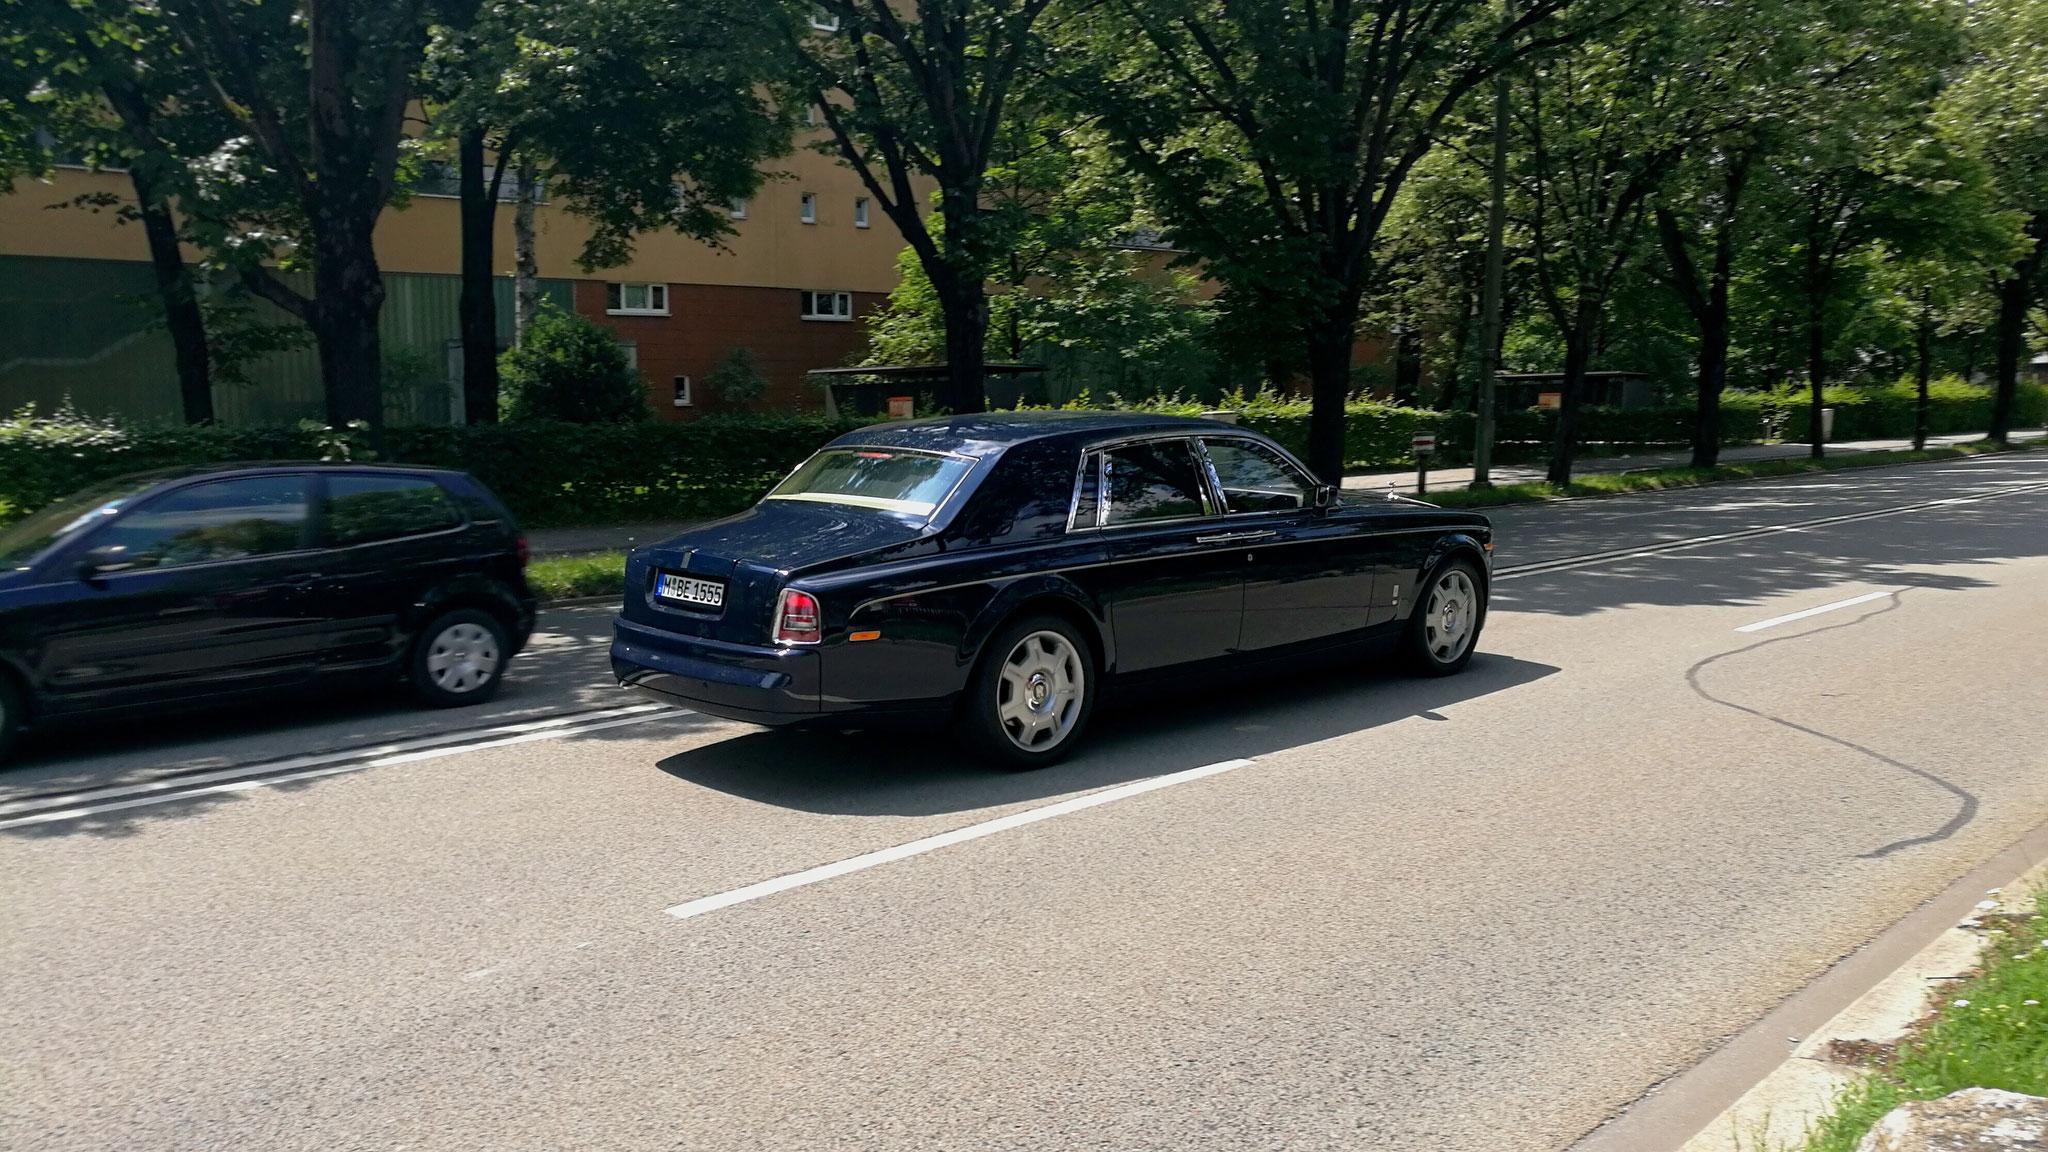 Rolls Royce Phantom - M-BE-1555